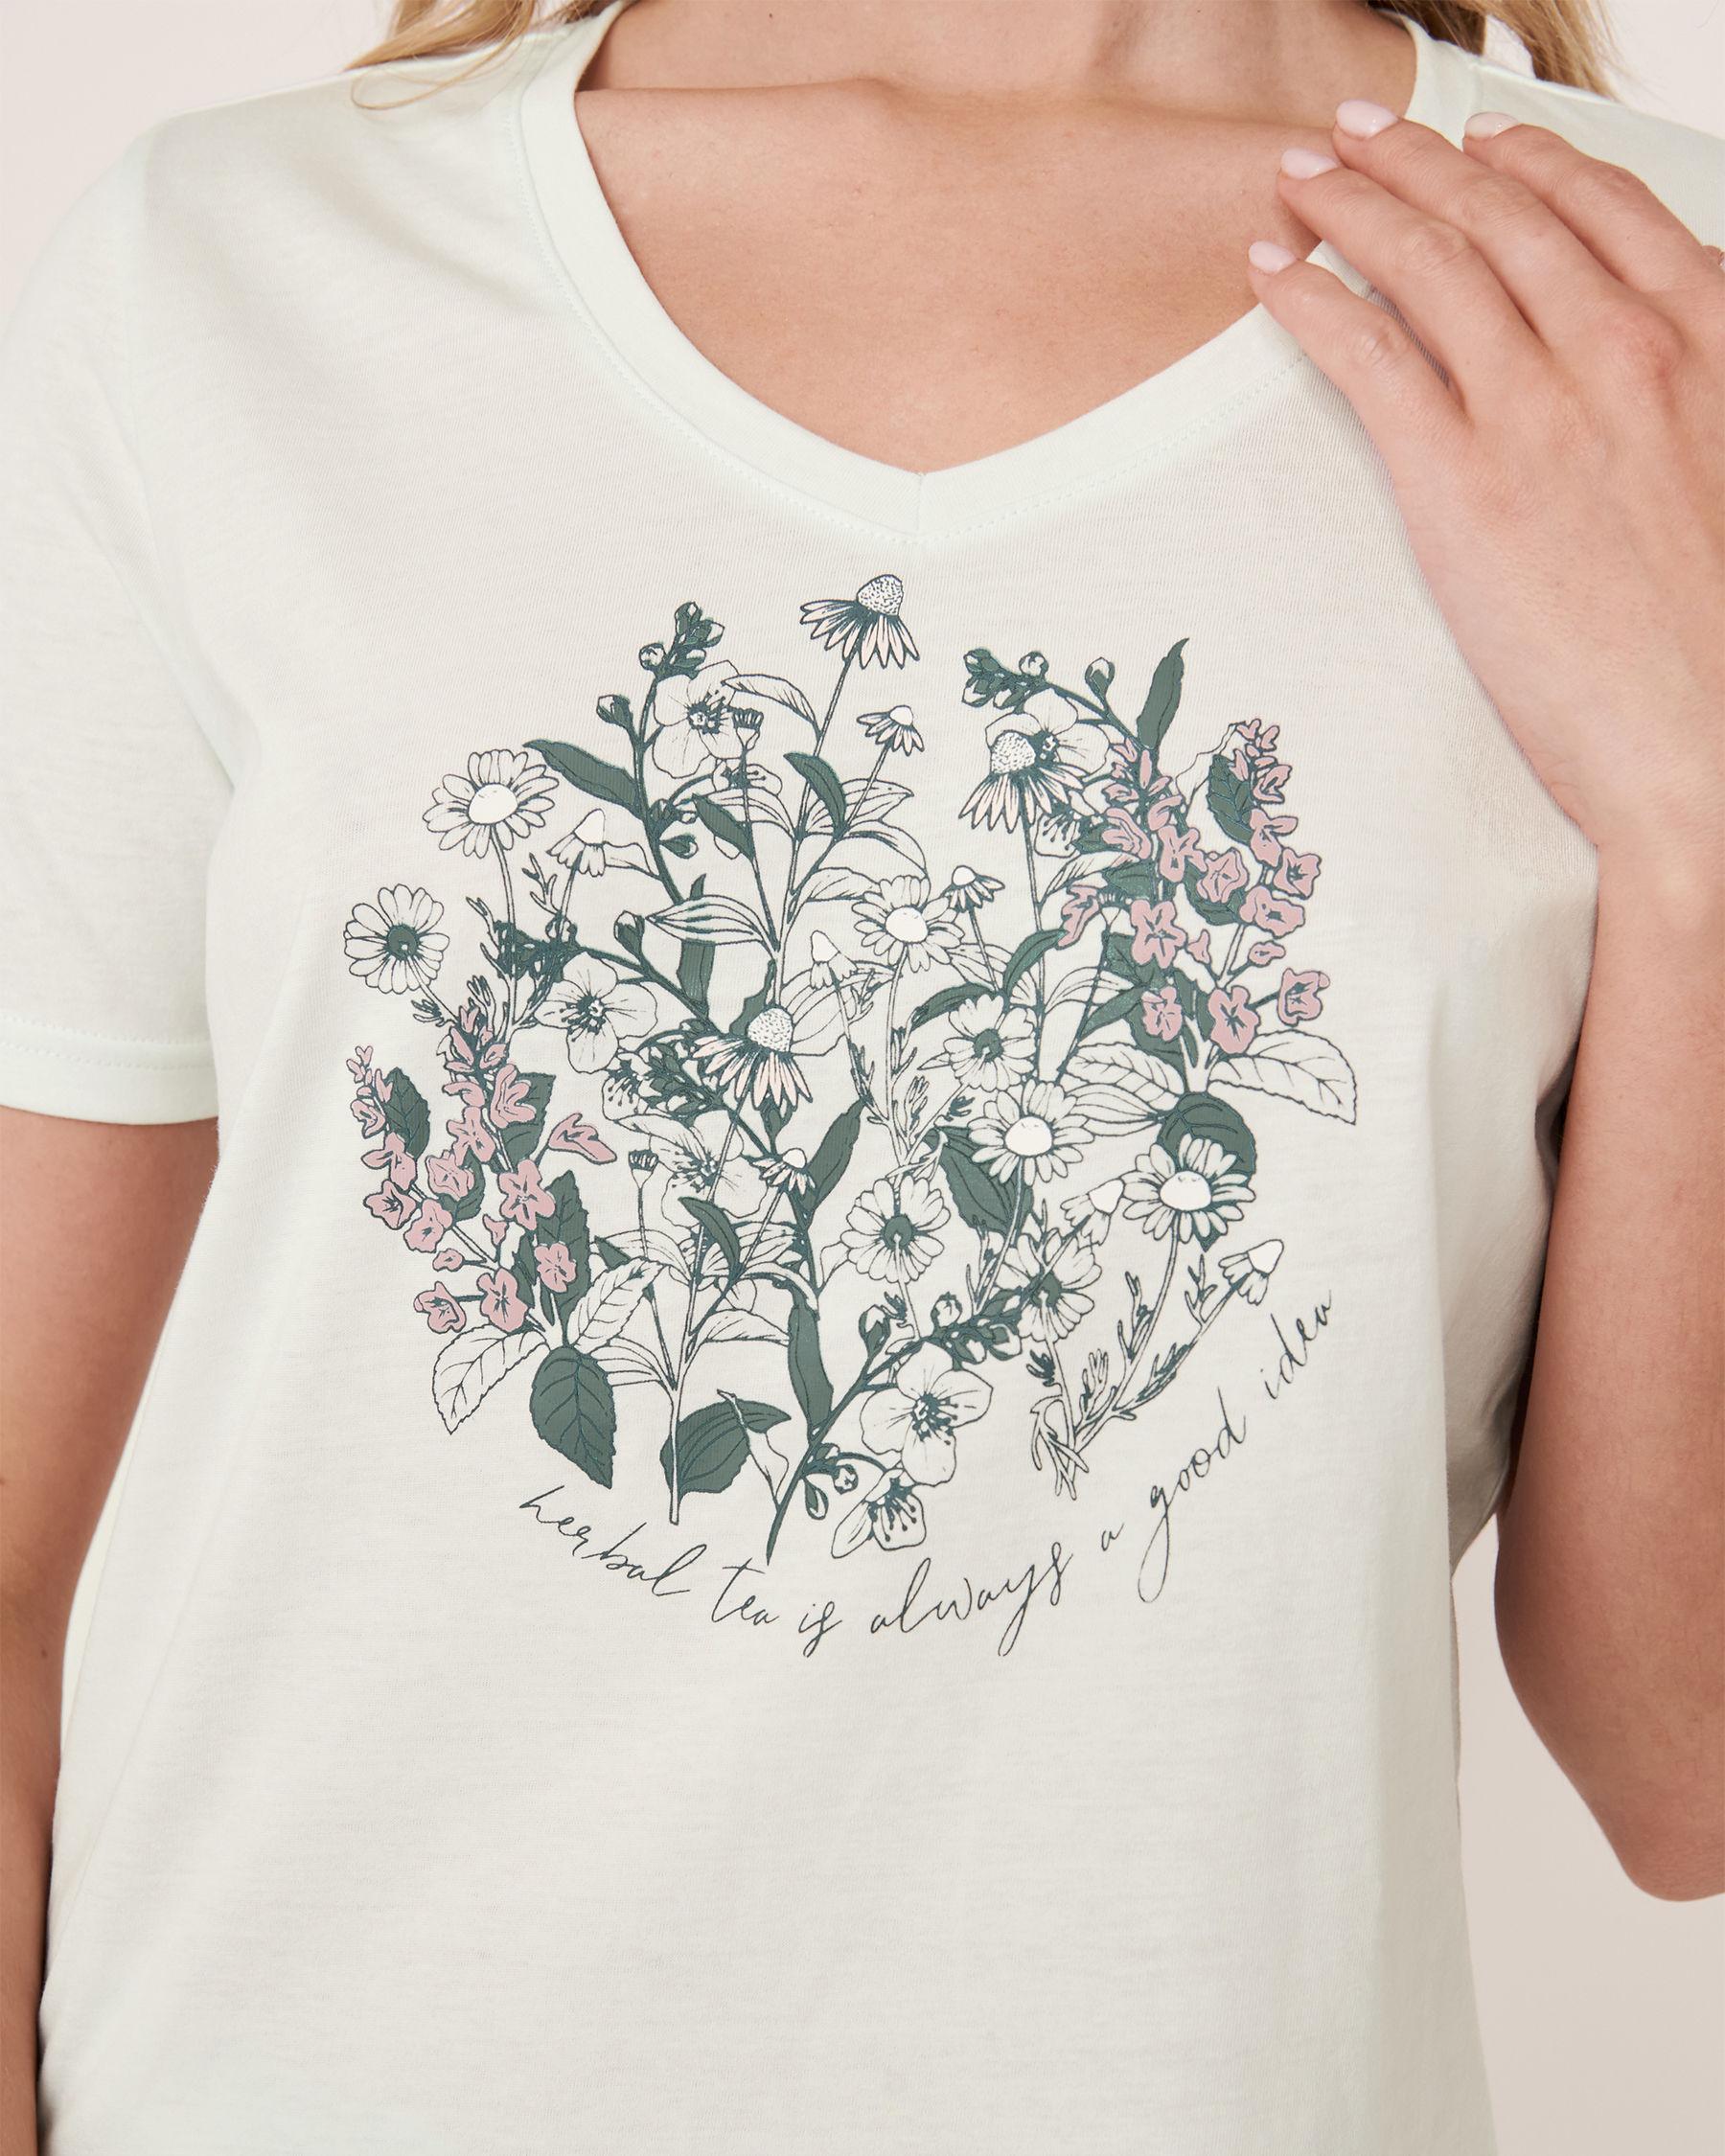 LA VIE EN ROSE V-neckline T-shirt Light aqua 40100180 - View1